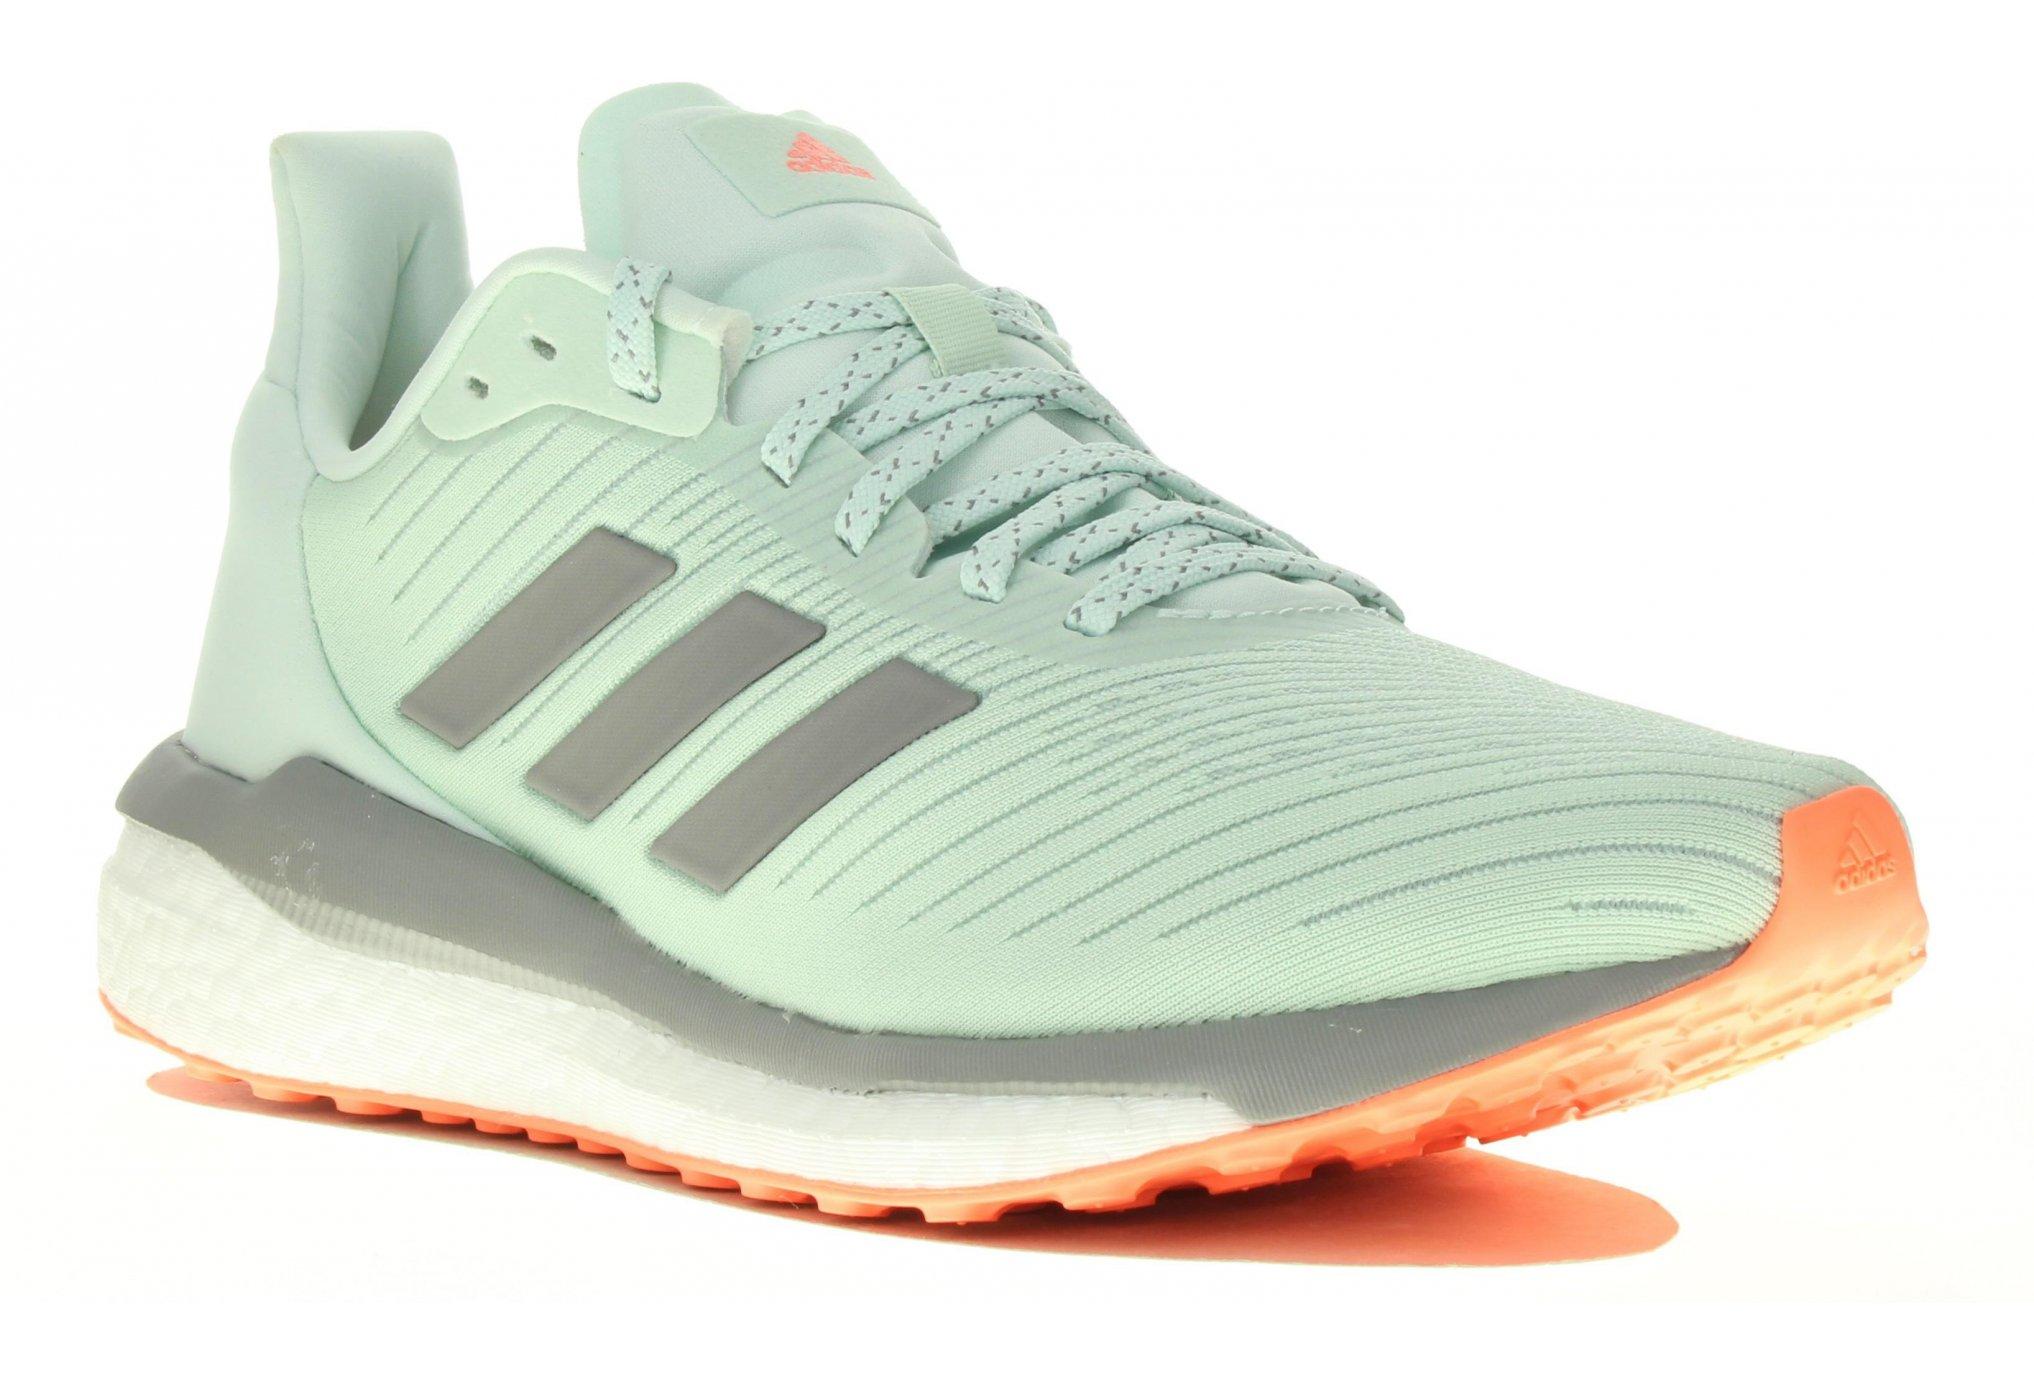 adidas Solar Drive 19 Chaussures running femme